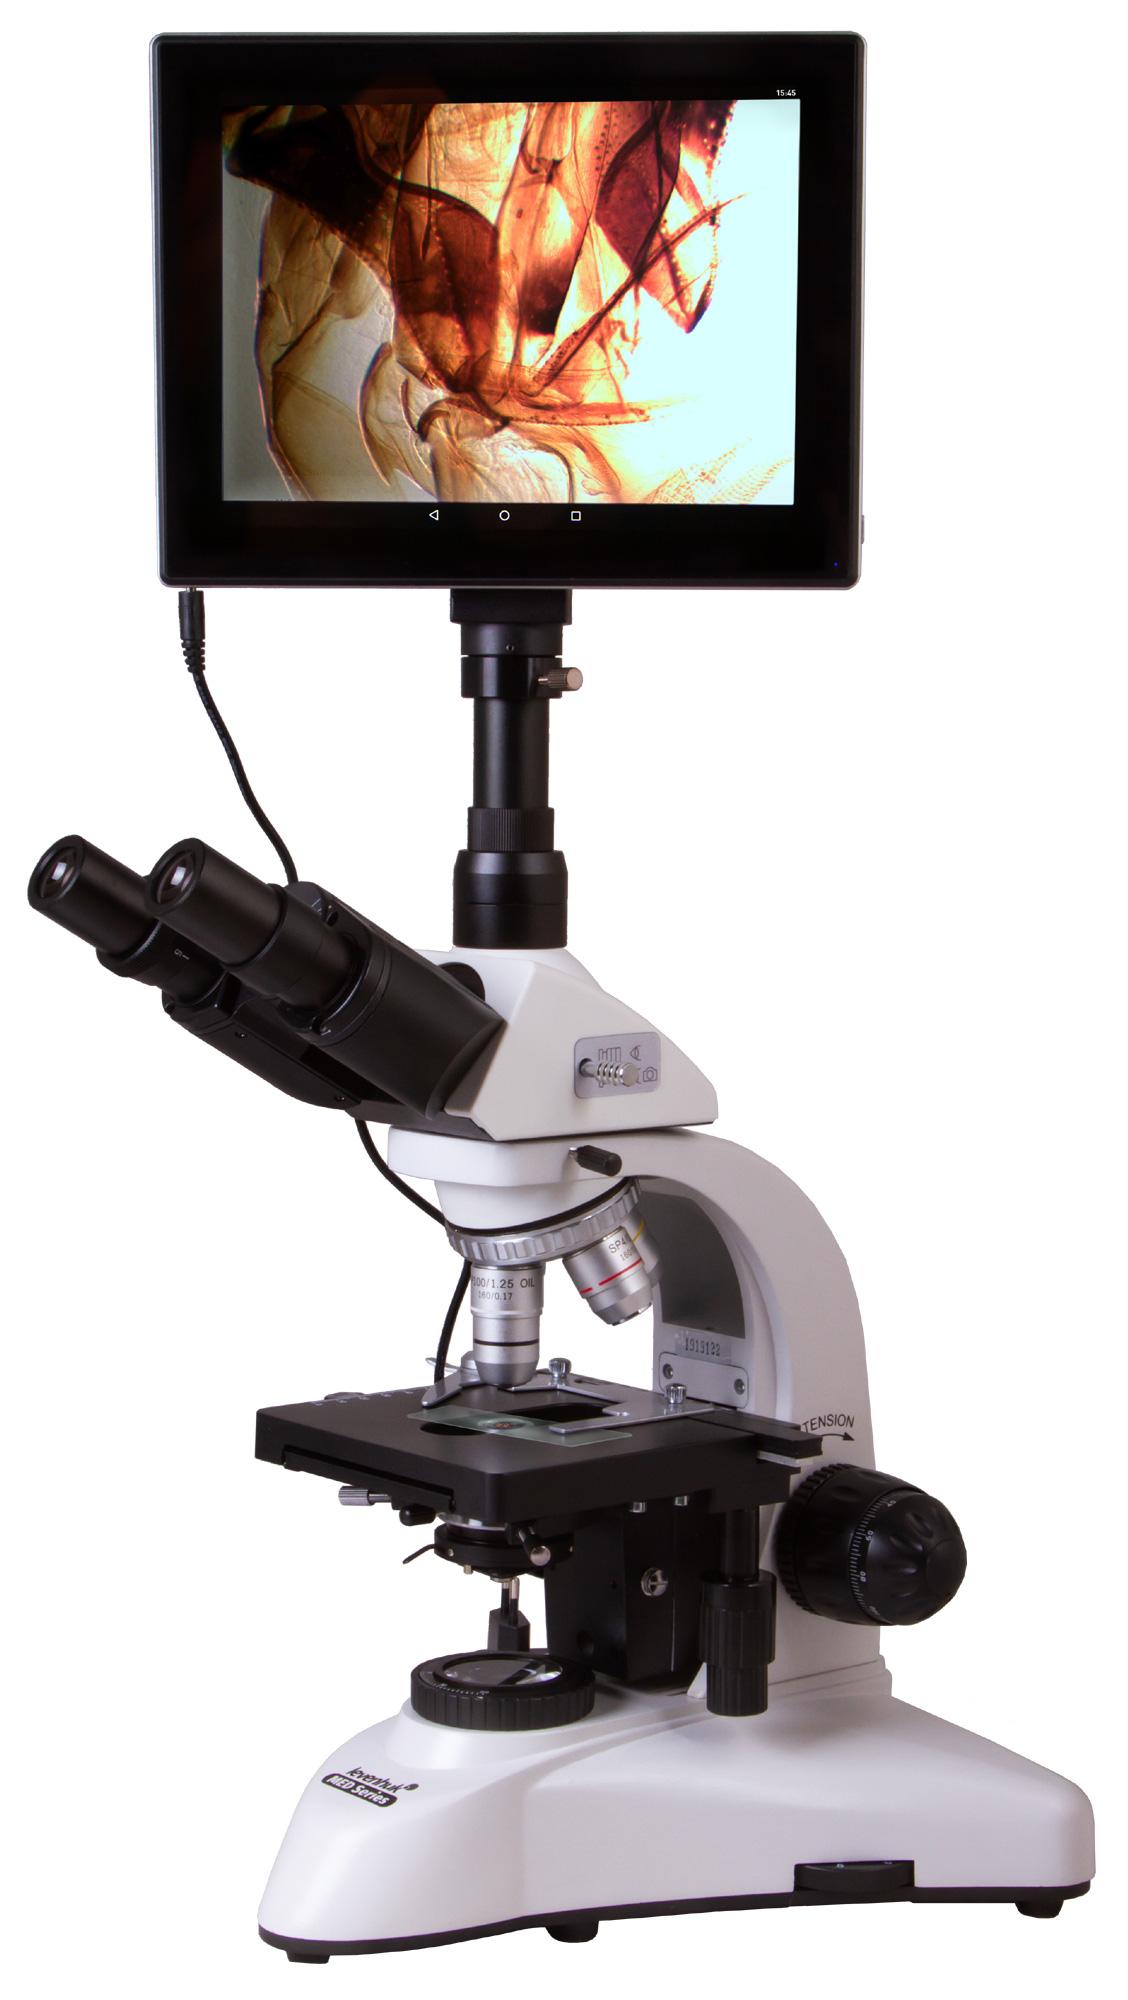 Microscopio trinoculare digitale Levenhuk MED D20T LCD